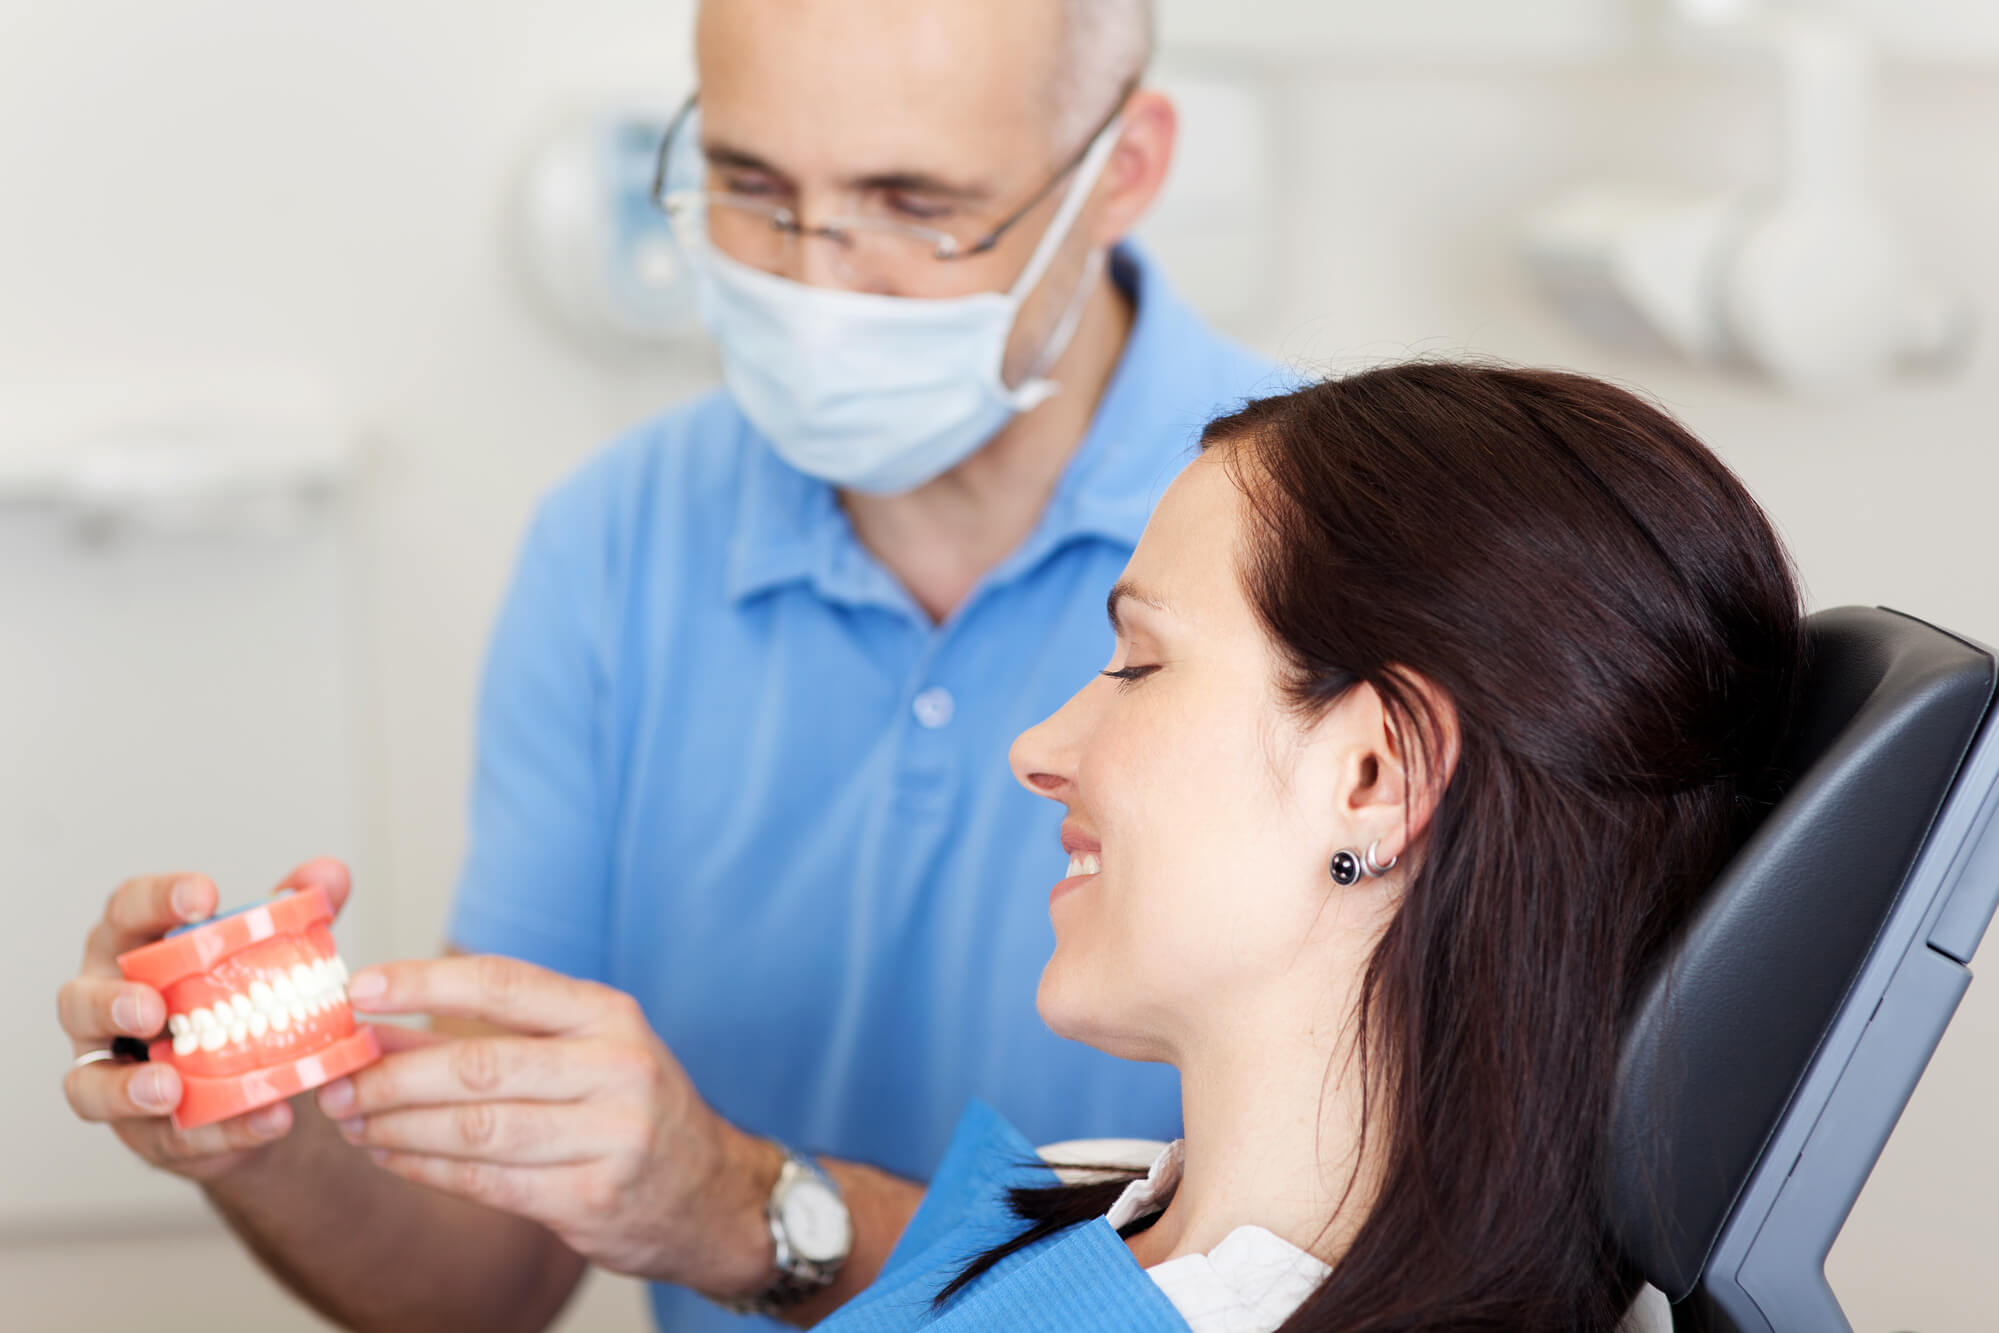 Dentist showing a girl a set of Port St. Lucie Dentures